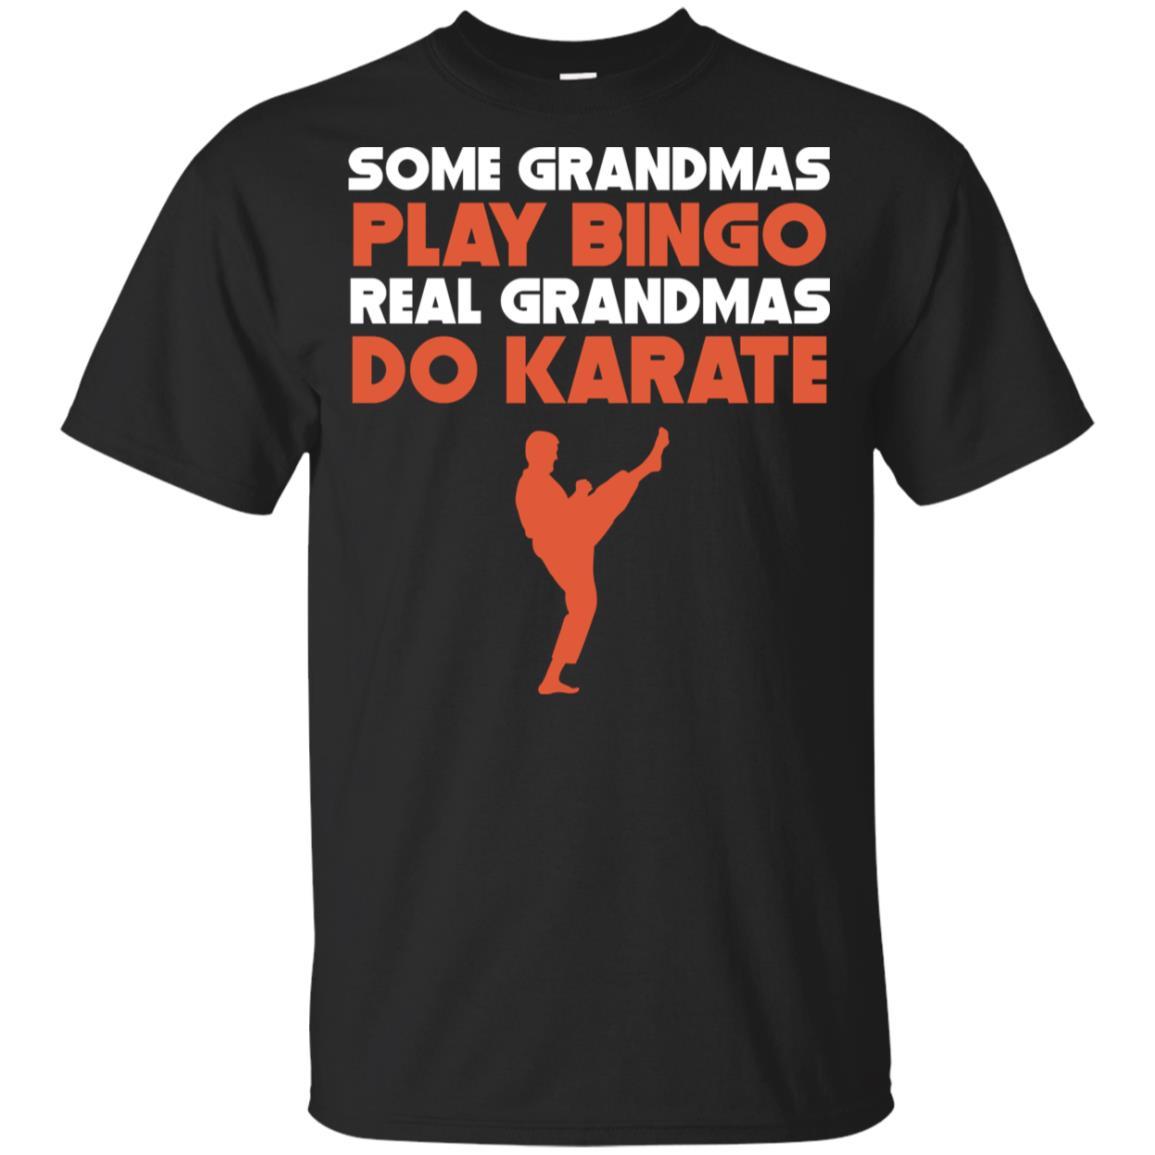 Some Grandmas Play Bingo Real Grandmas Do Karate Youth Short Sleeve